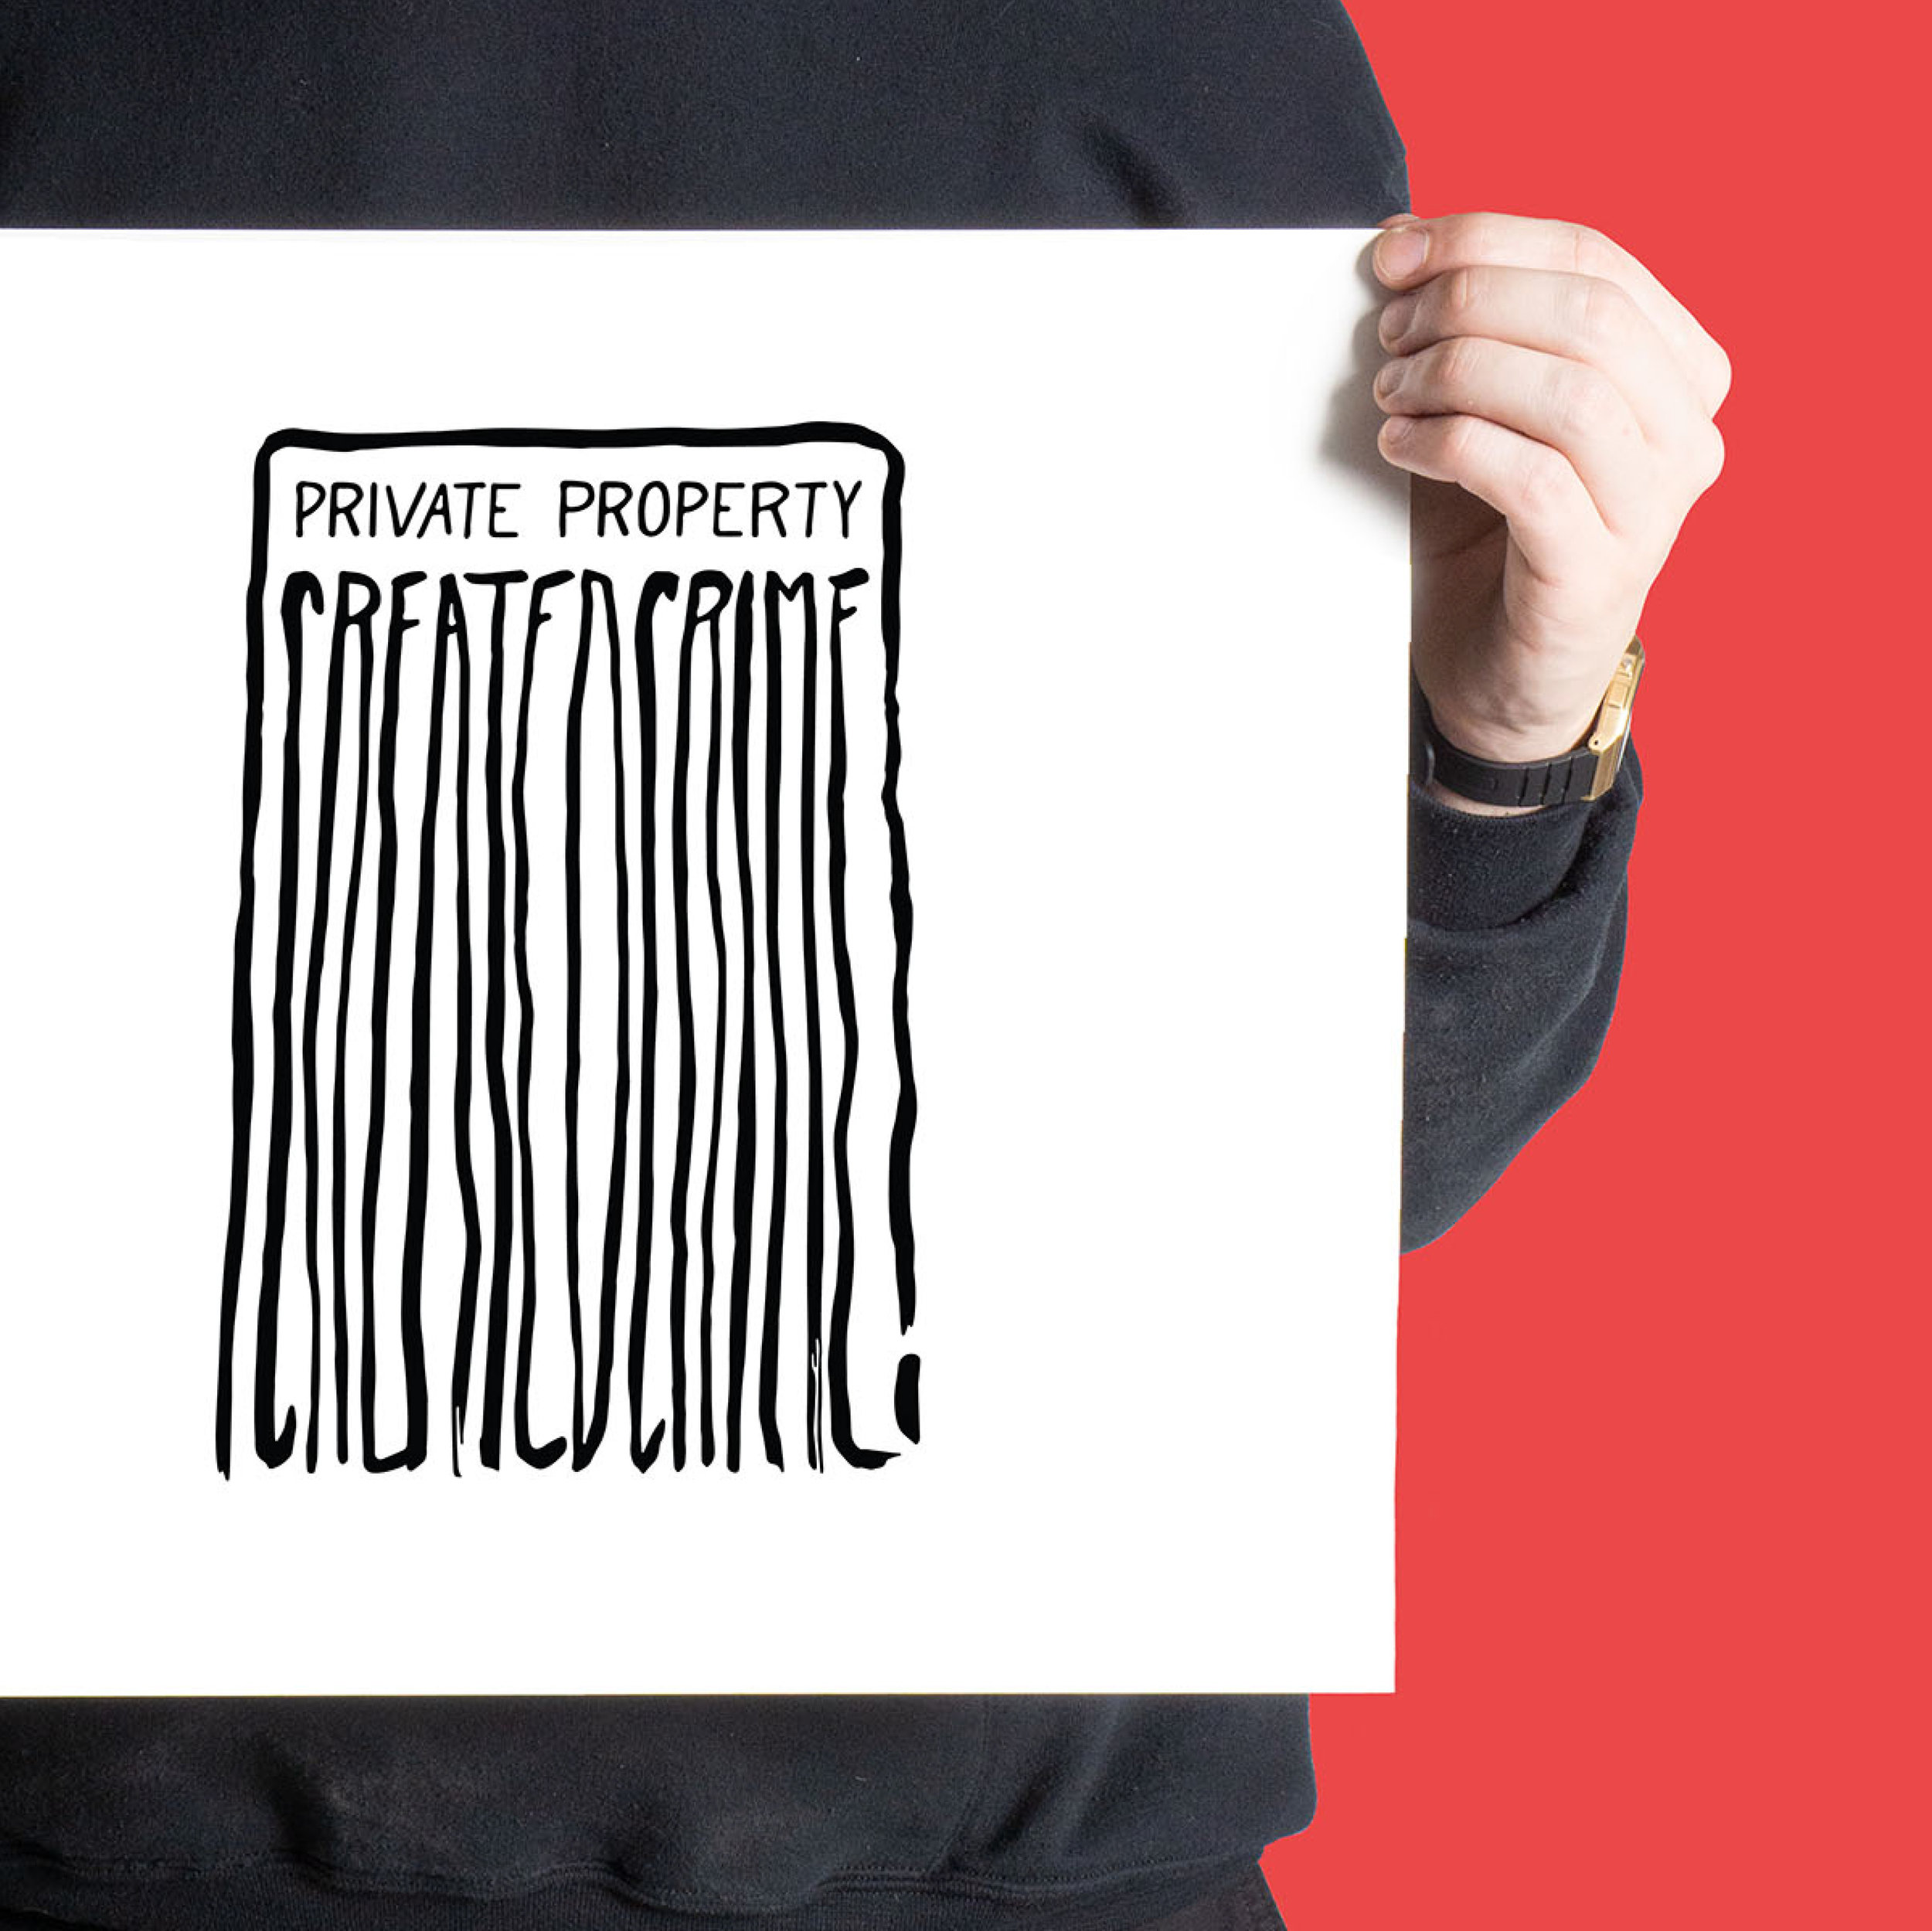 PRIVATE_PROPERTY_CREATED_CRIME